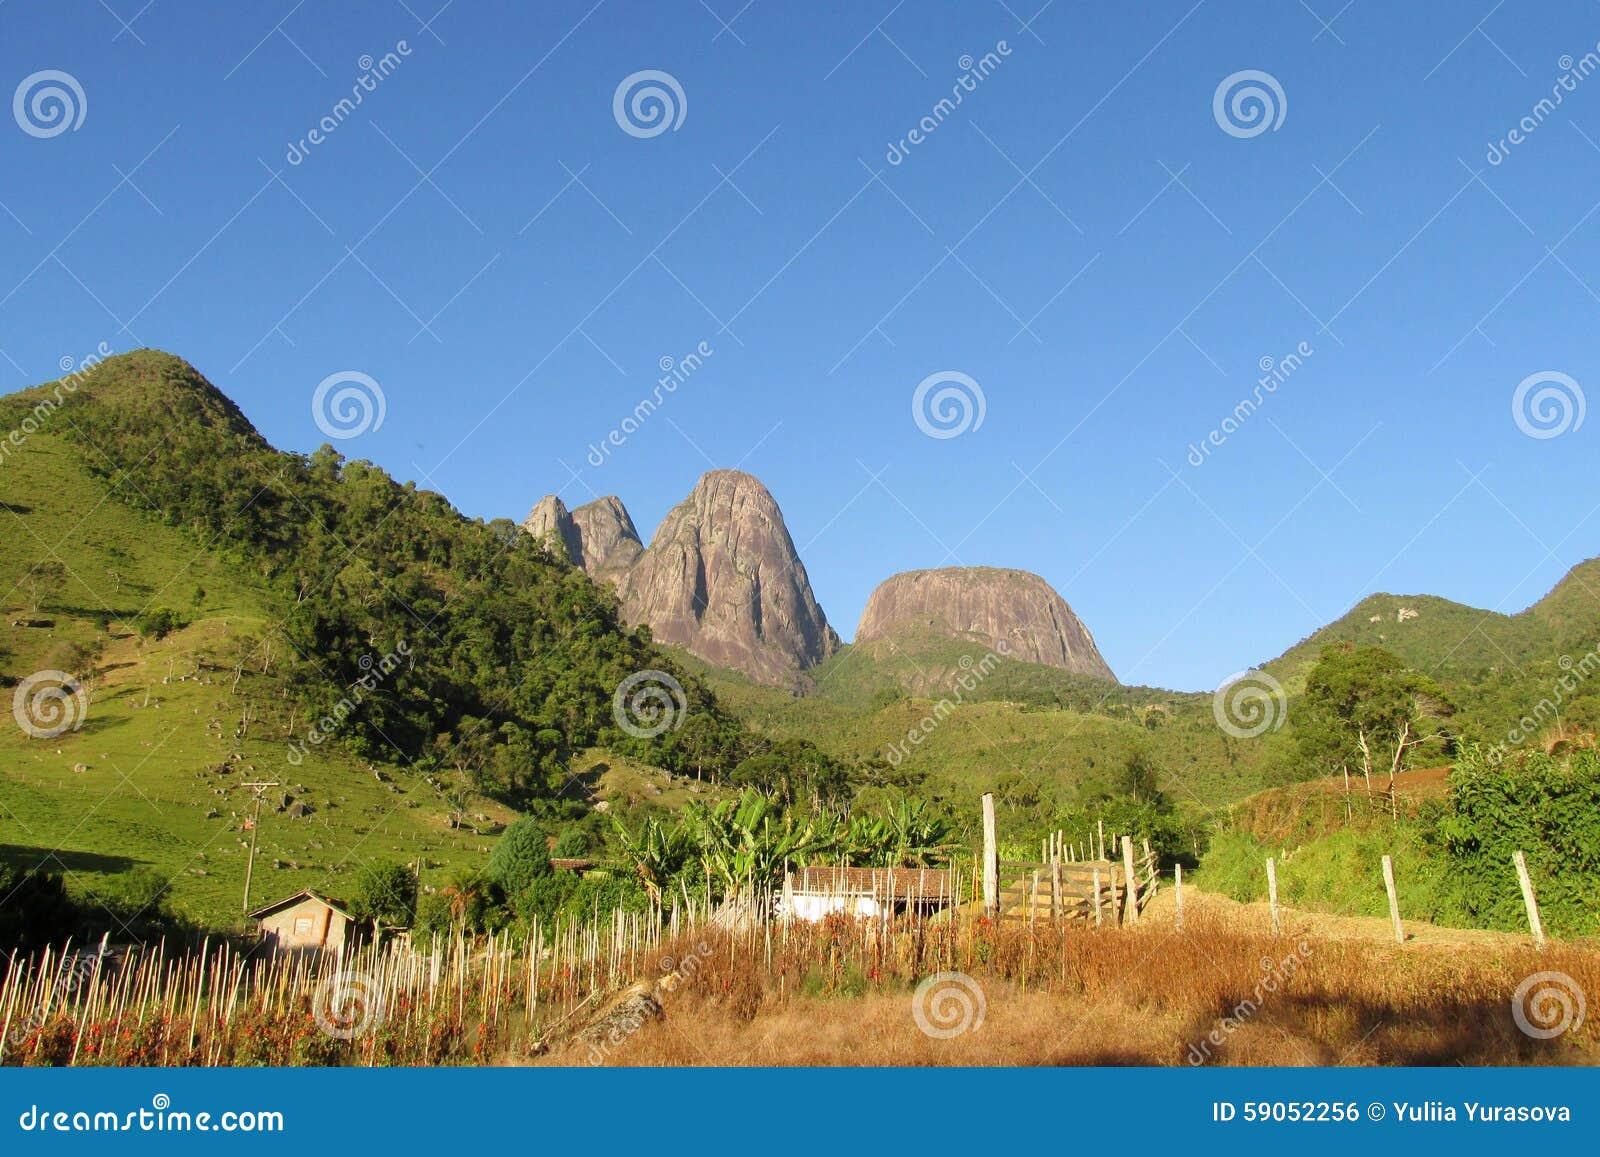 Mooi landschap van groen bos, gebied en vlotte rotsen